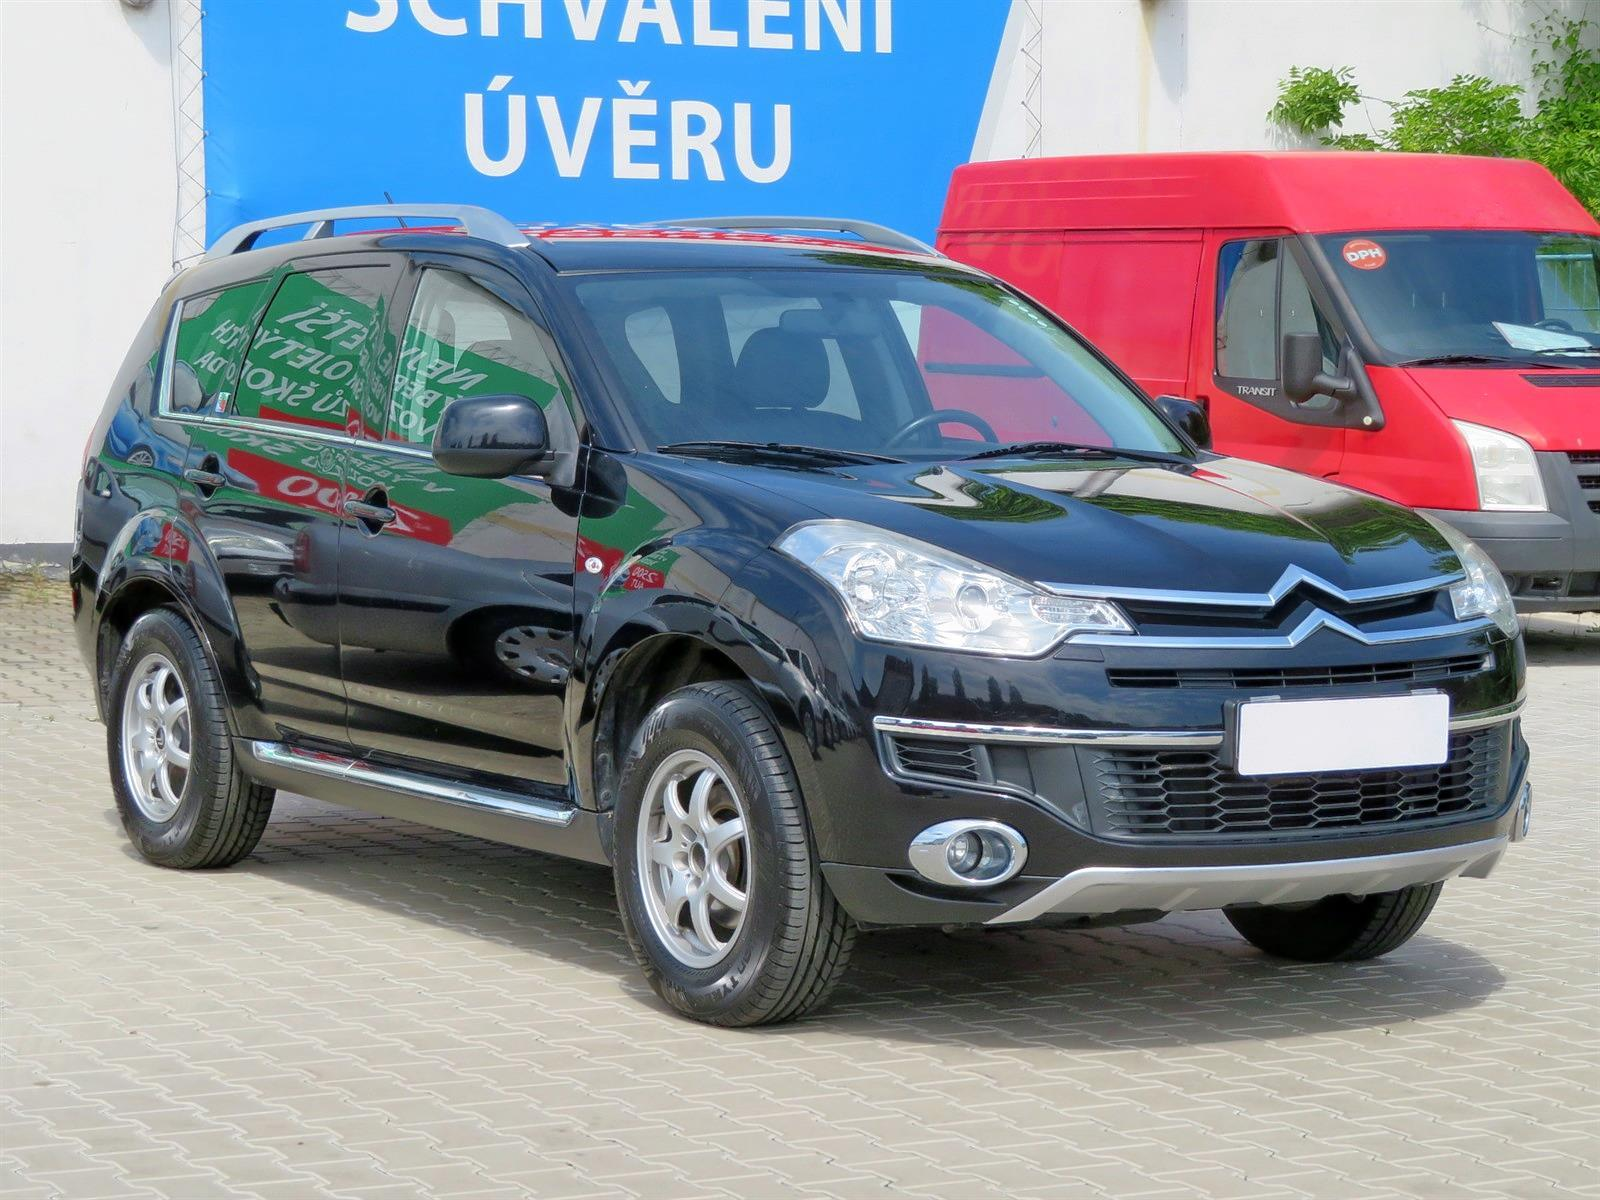 Citroën C-Crosser 2.2 HDI 115kW SUV nafta